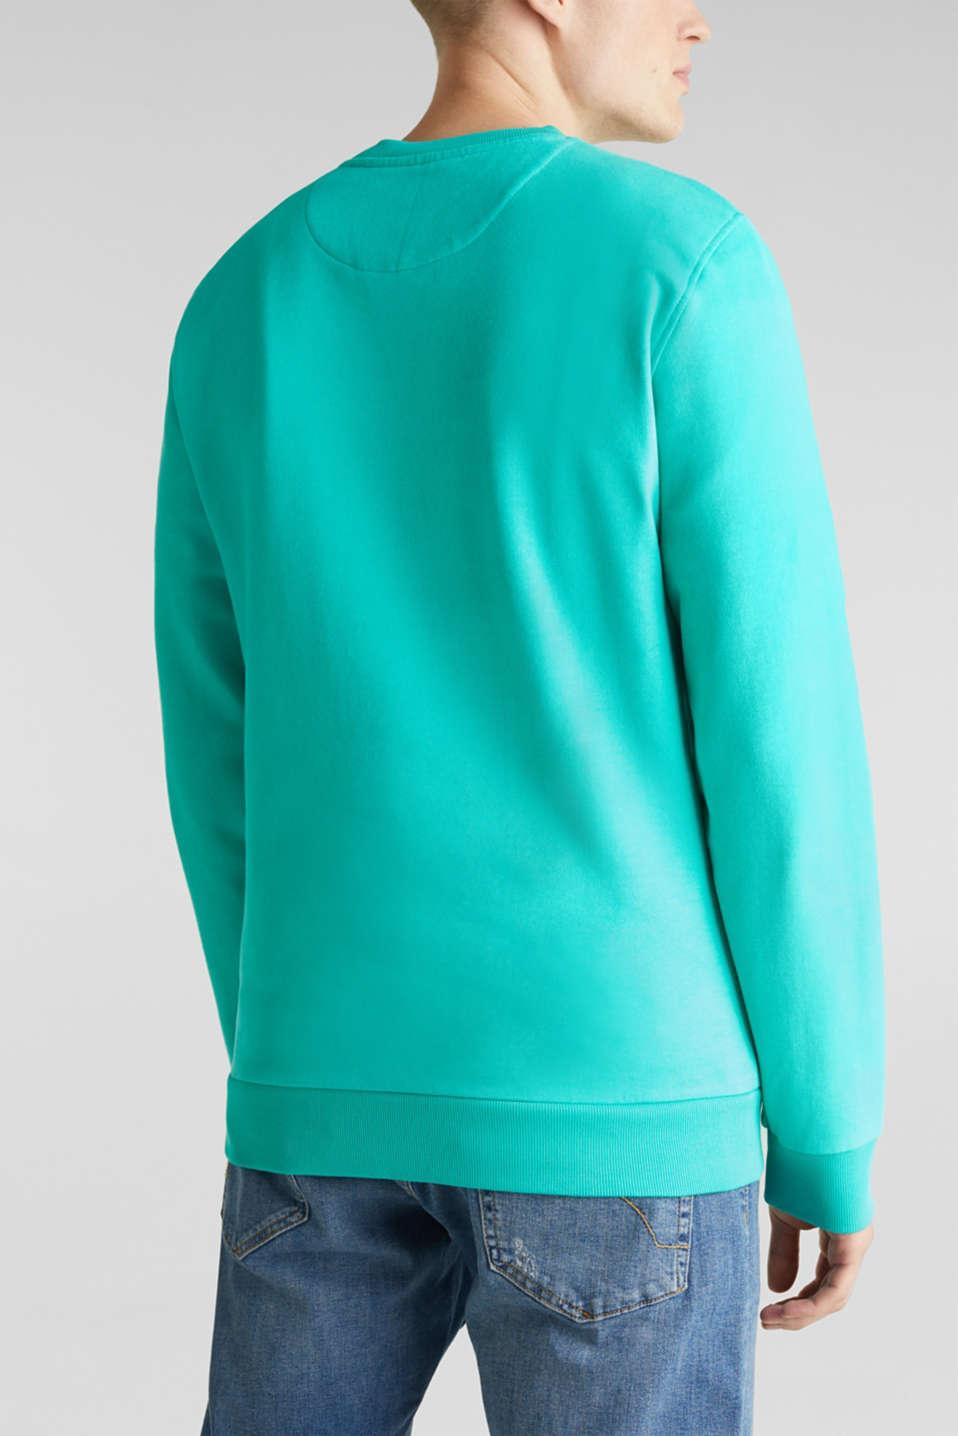 Sweatshirt in 100% cotton, AQUA GREEN 2, detail image number 3